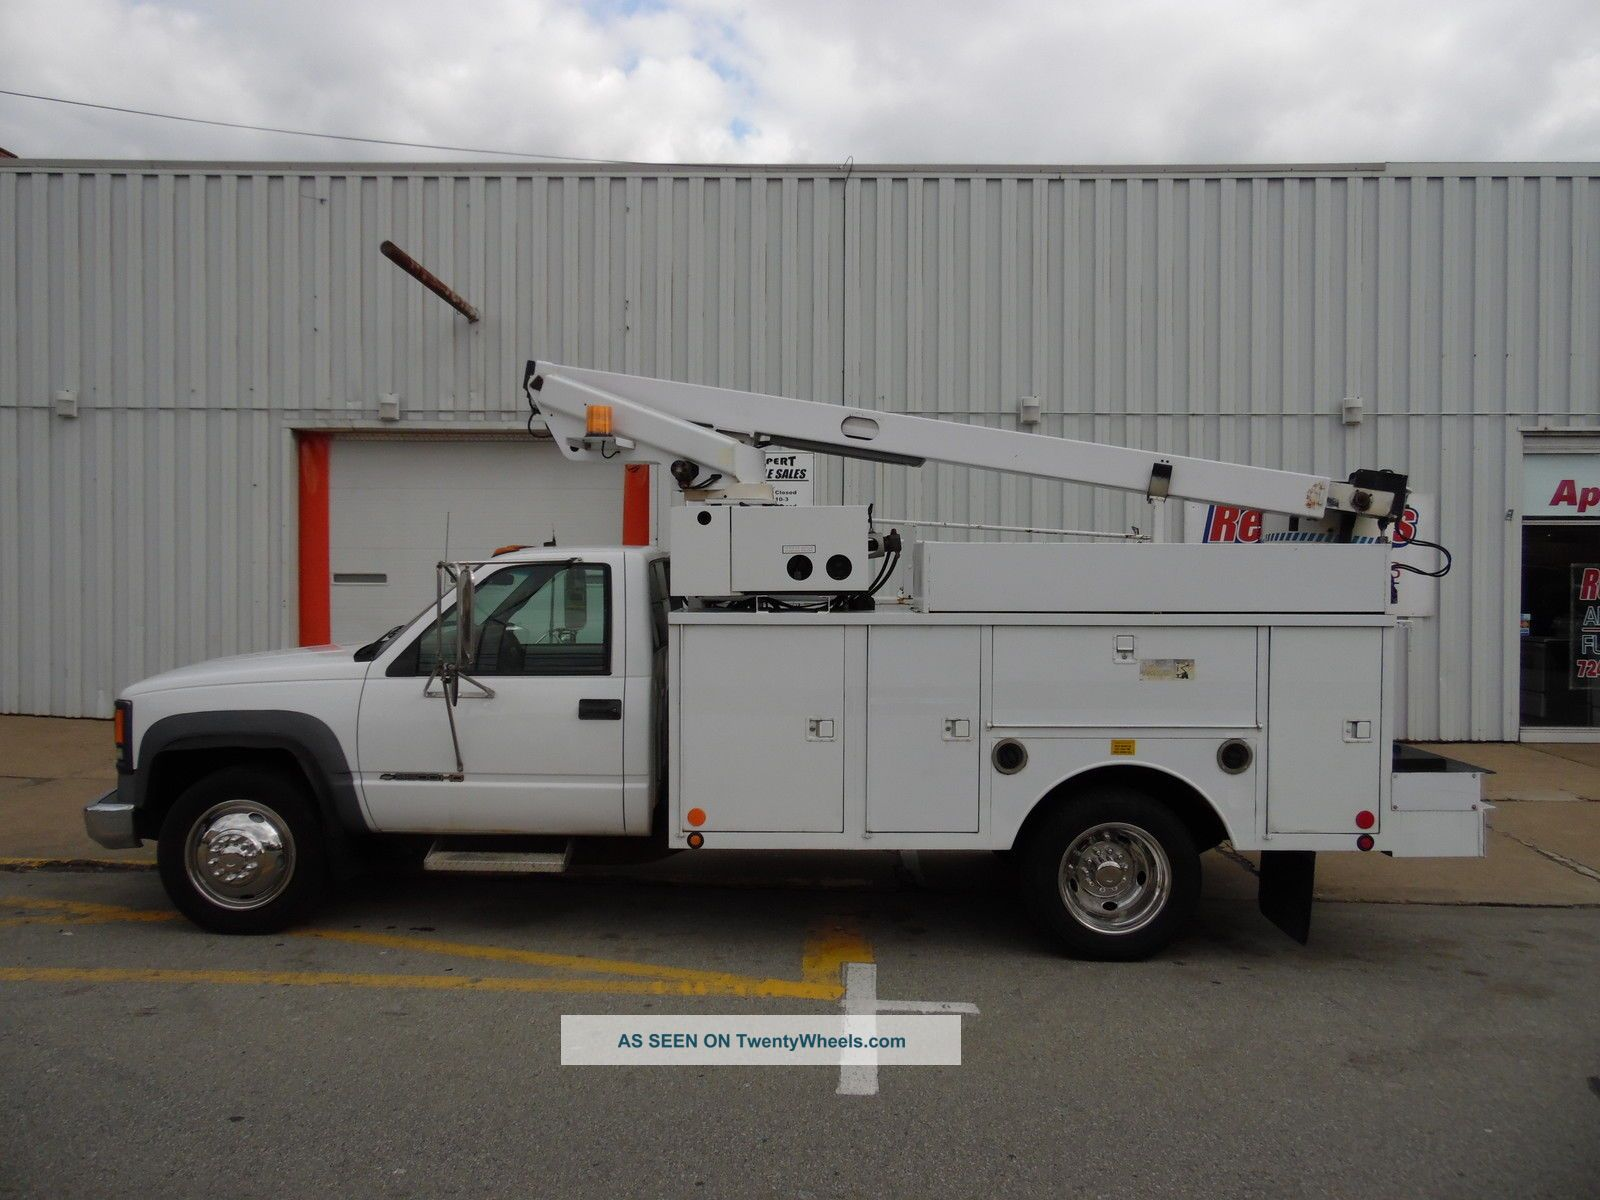 2000 Chevrolet C - 3500hd Service Bucket Telsta Boom Truck